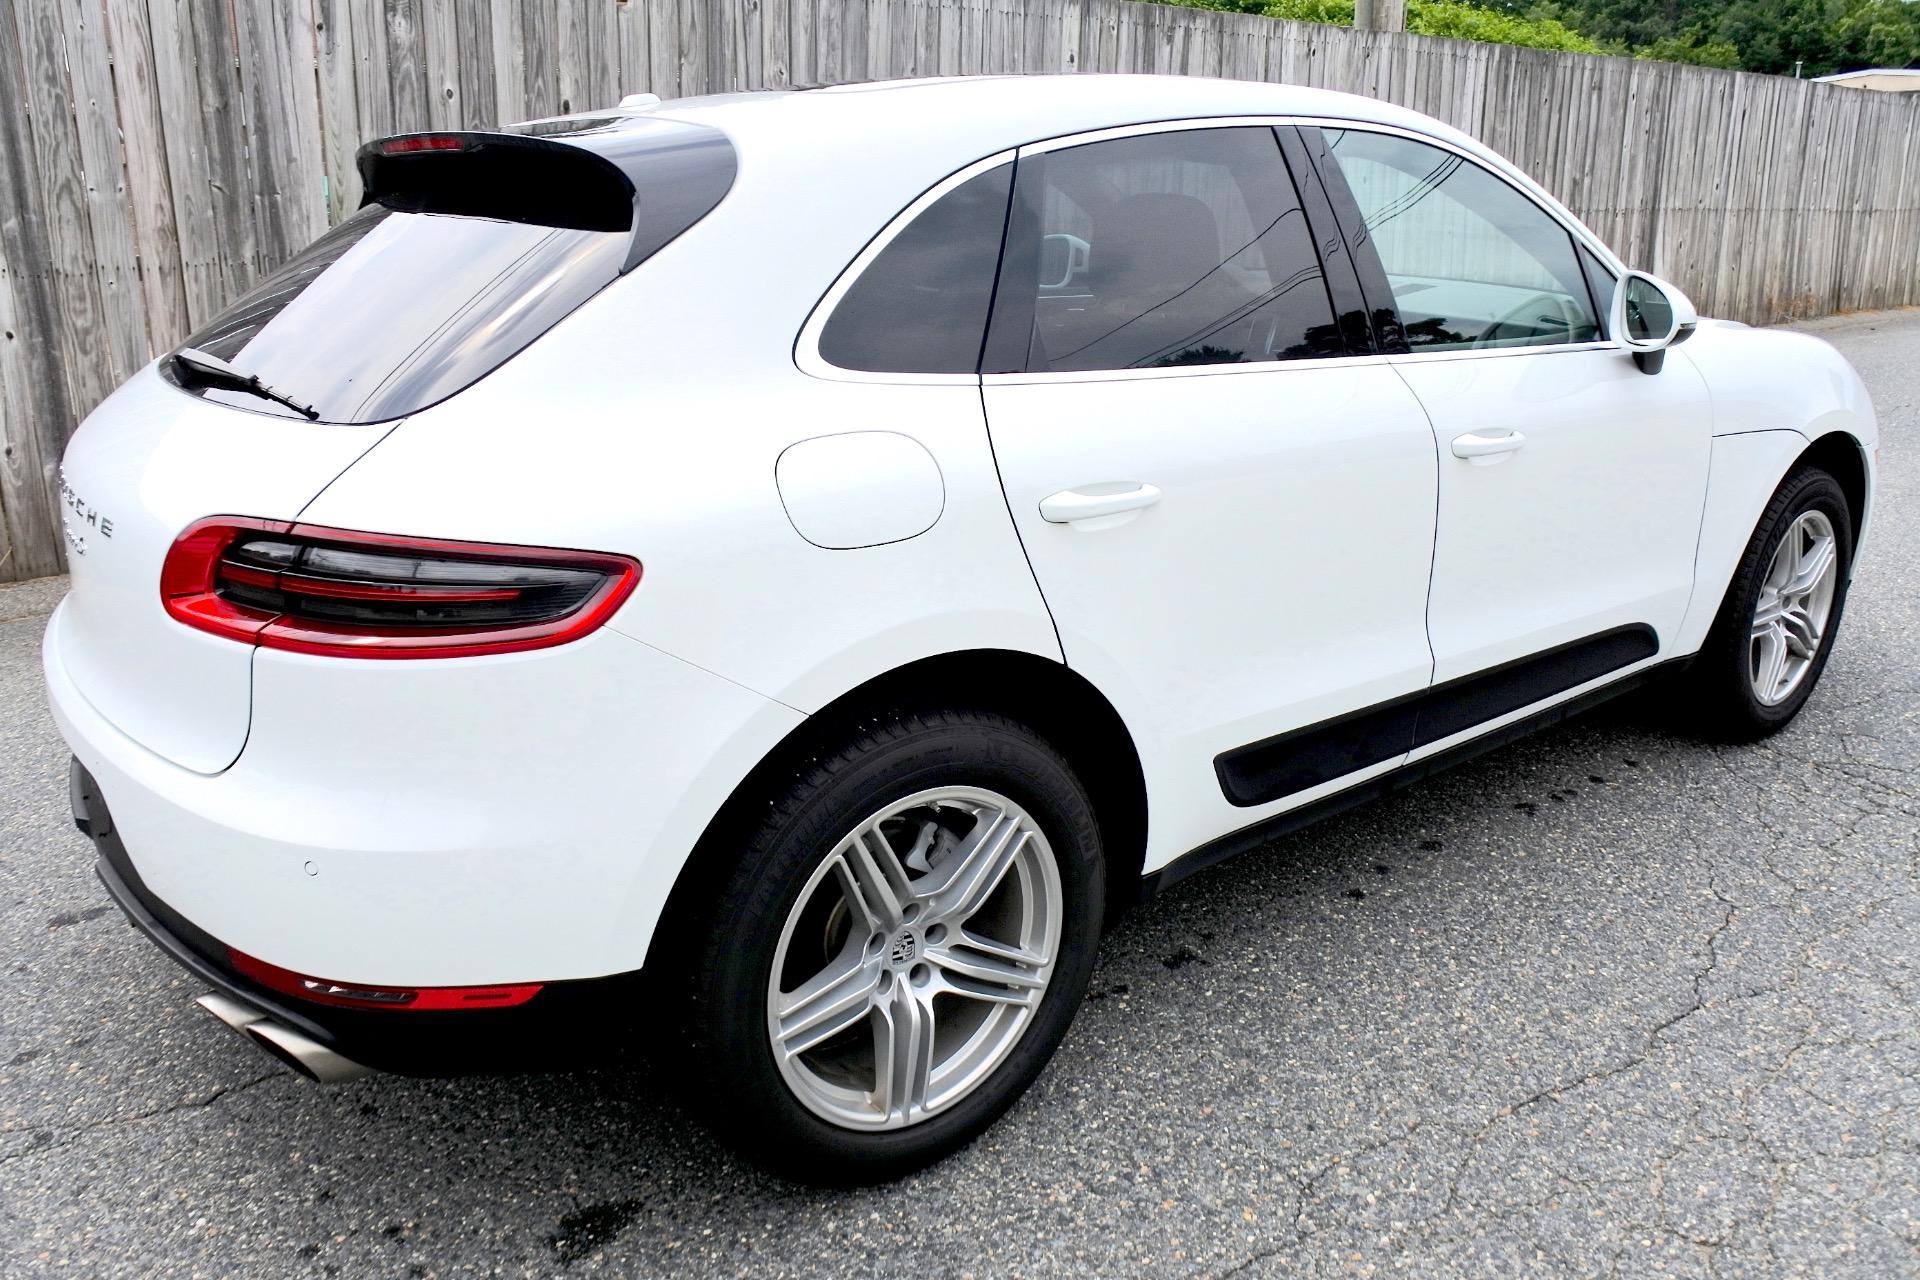 Used 2015 Porsche Macan S AWD Used 2015 Porsche Macan S AWD for sale  at Metro West Motorcars LLC in Shrewsbury MA 5